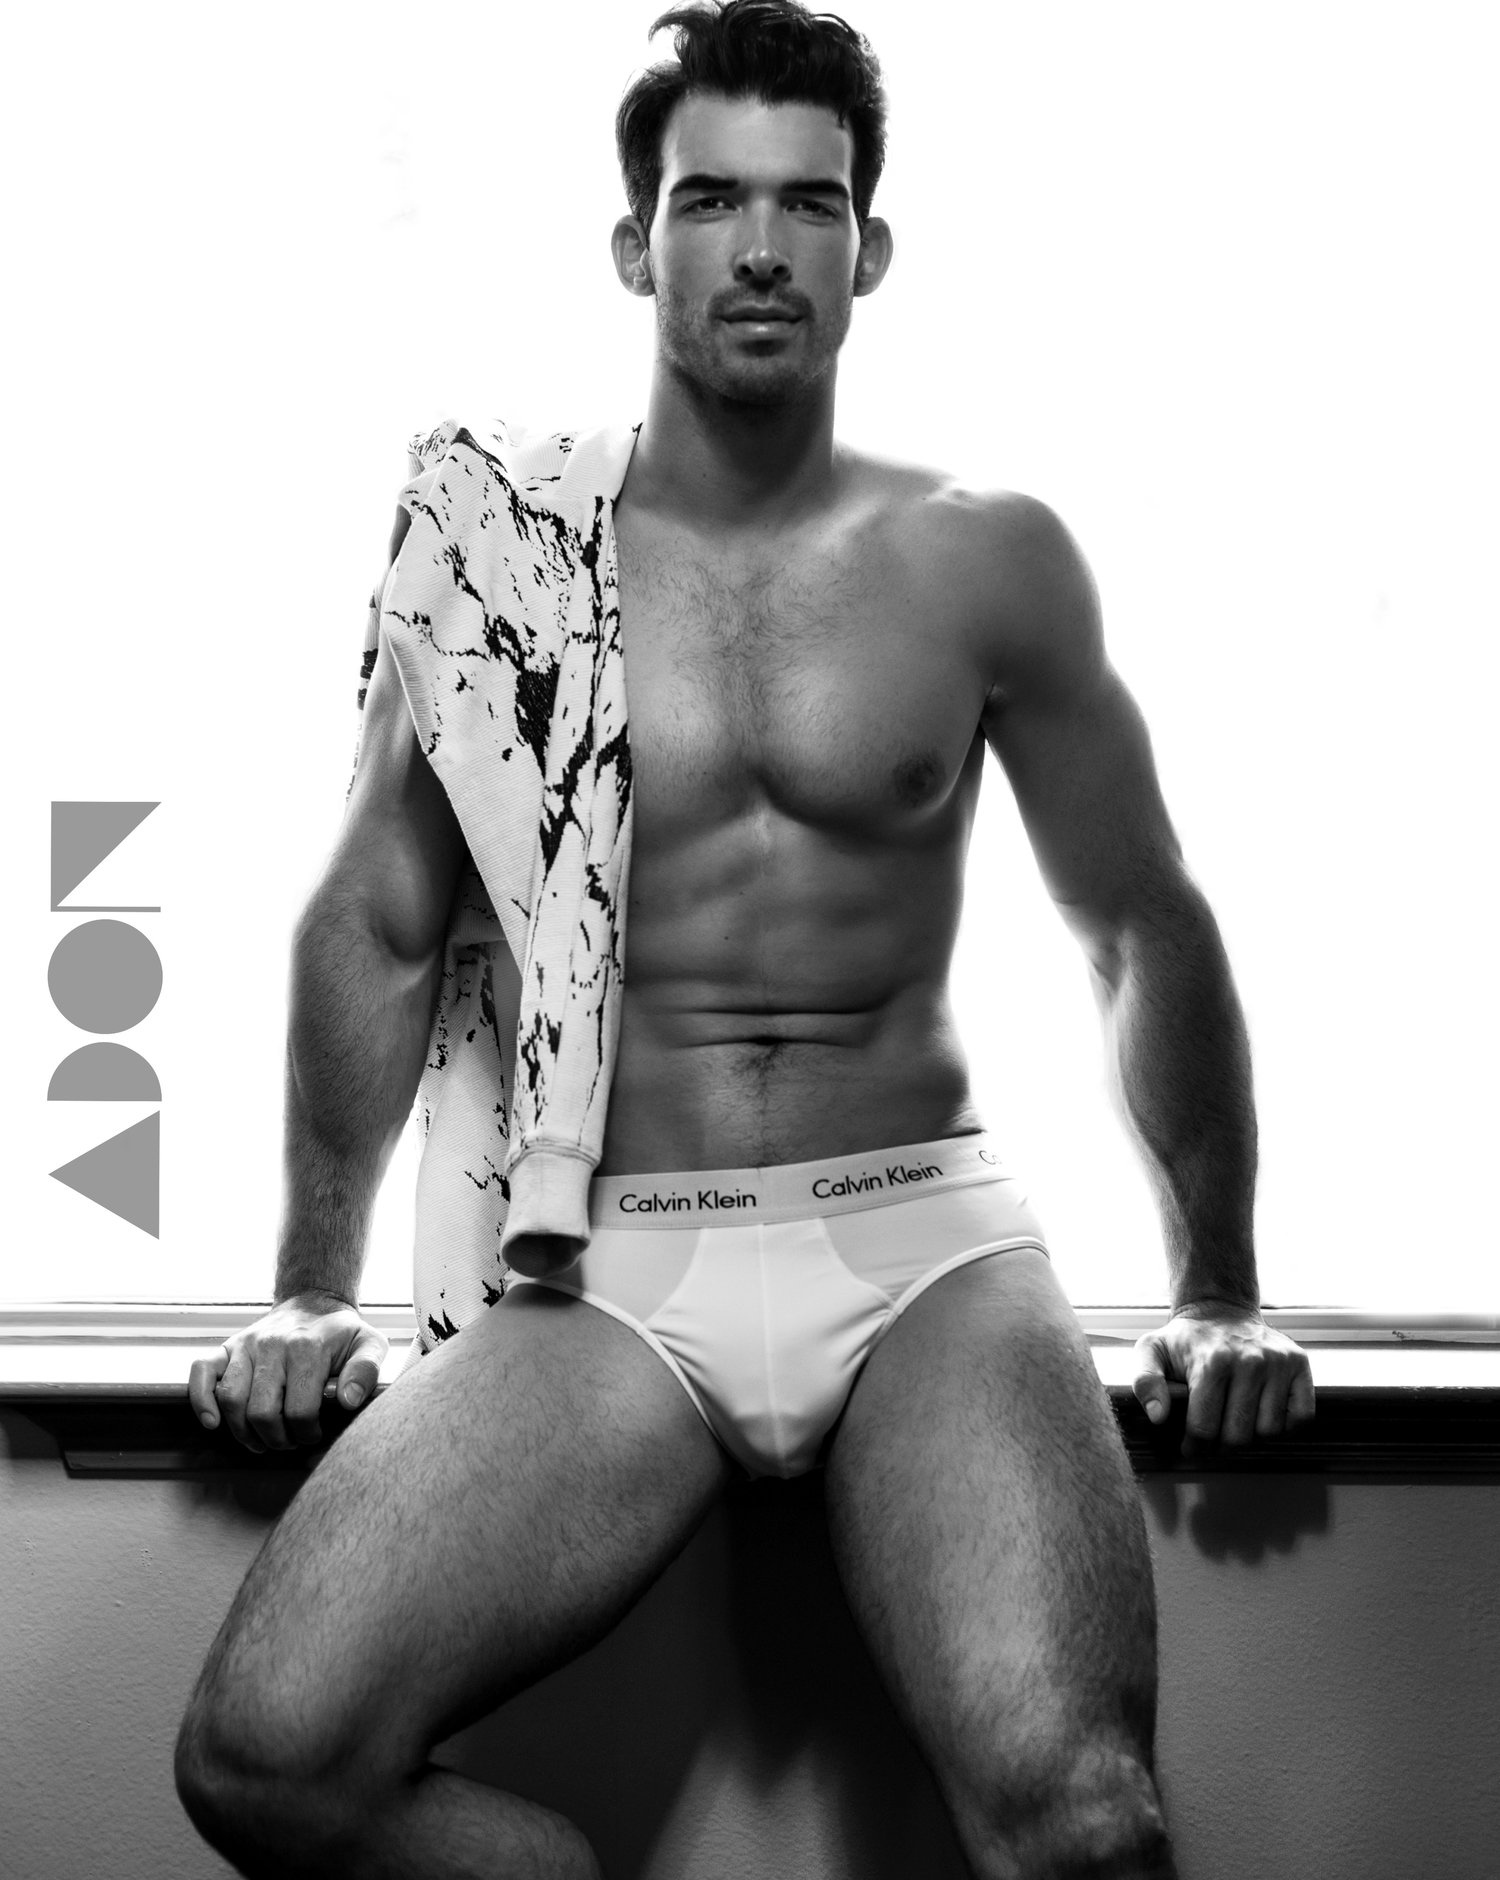 Adon Exclusive: Model Justin Payne By Tony Veloz